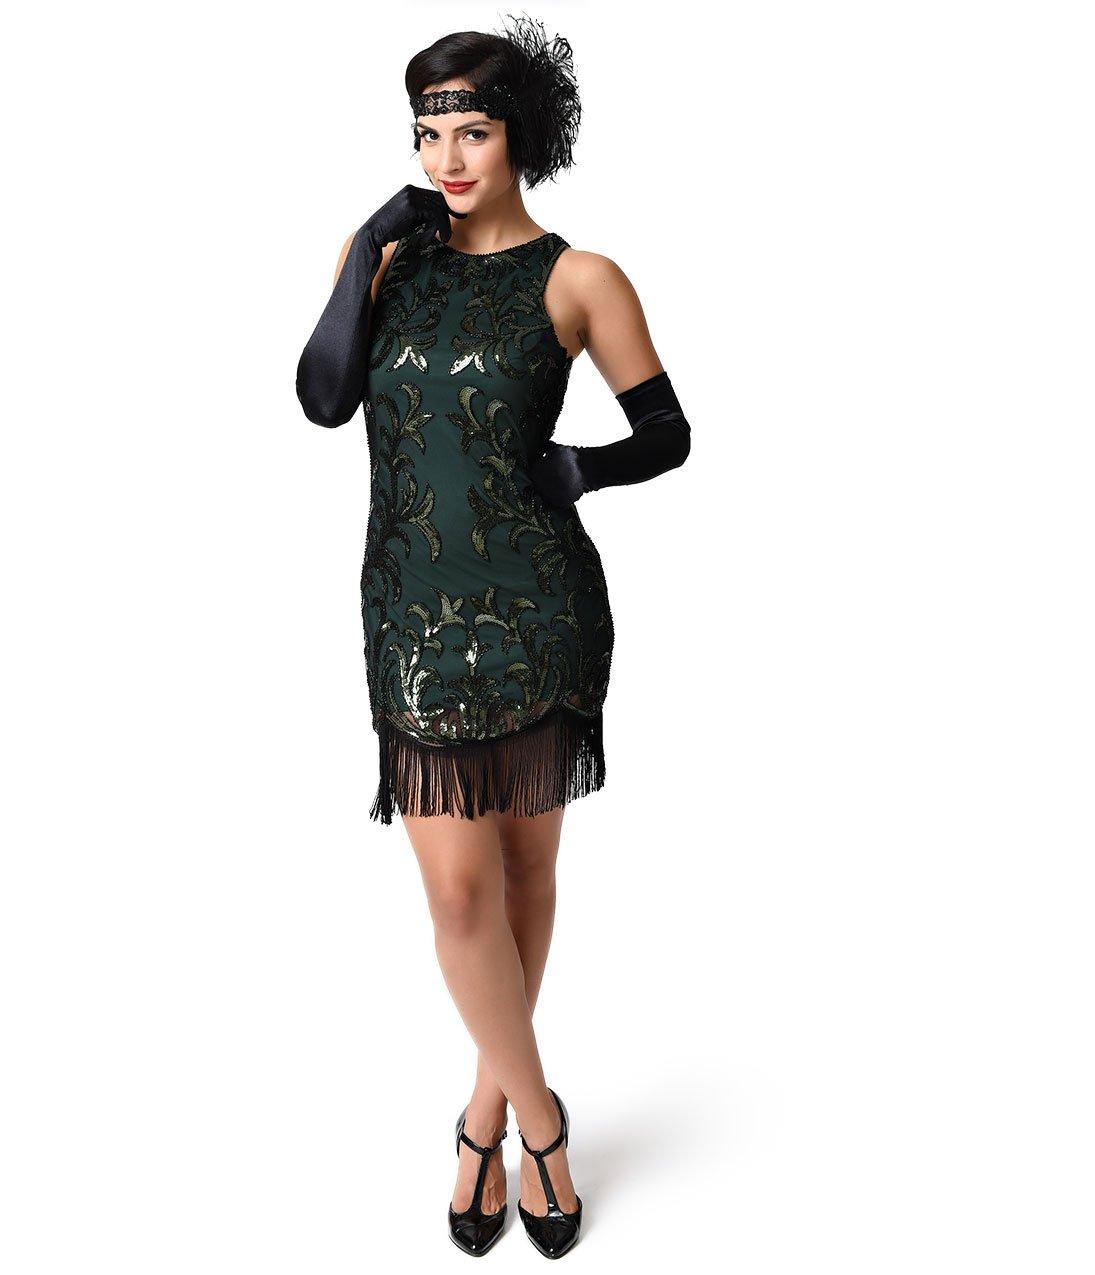 Unique Vintage 1920s Style Black & Emerald Deco Beaded Fringe Flapper Dress